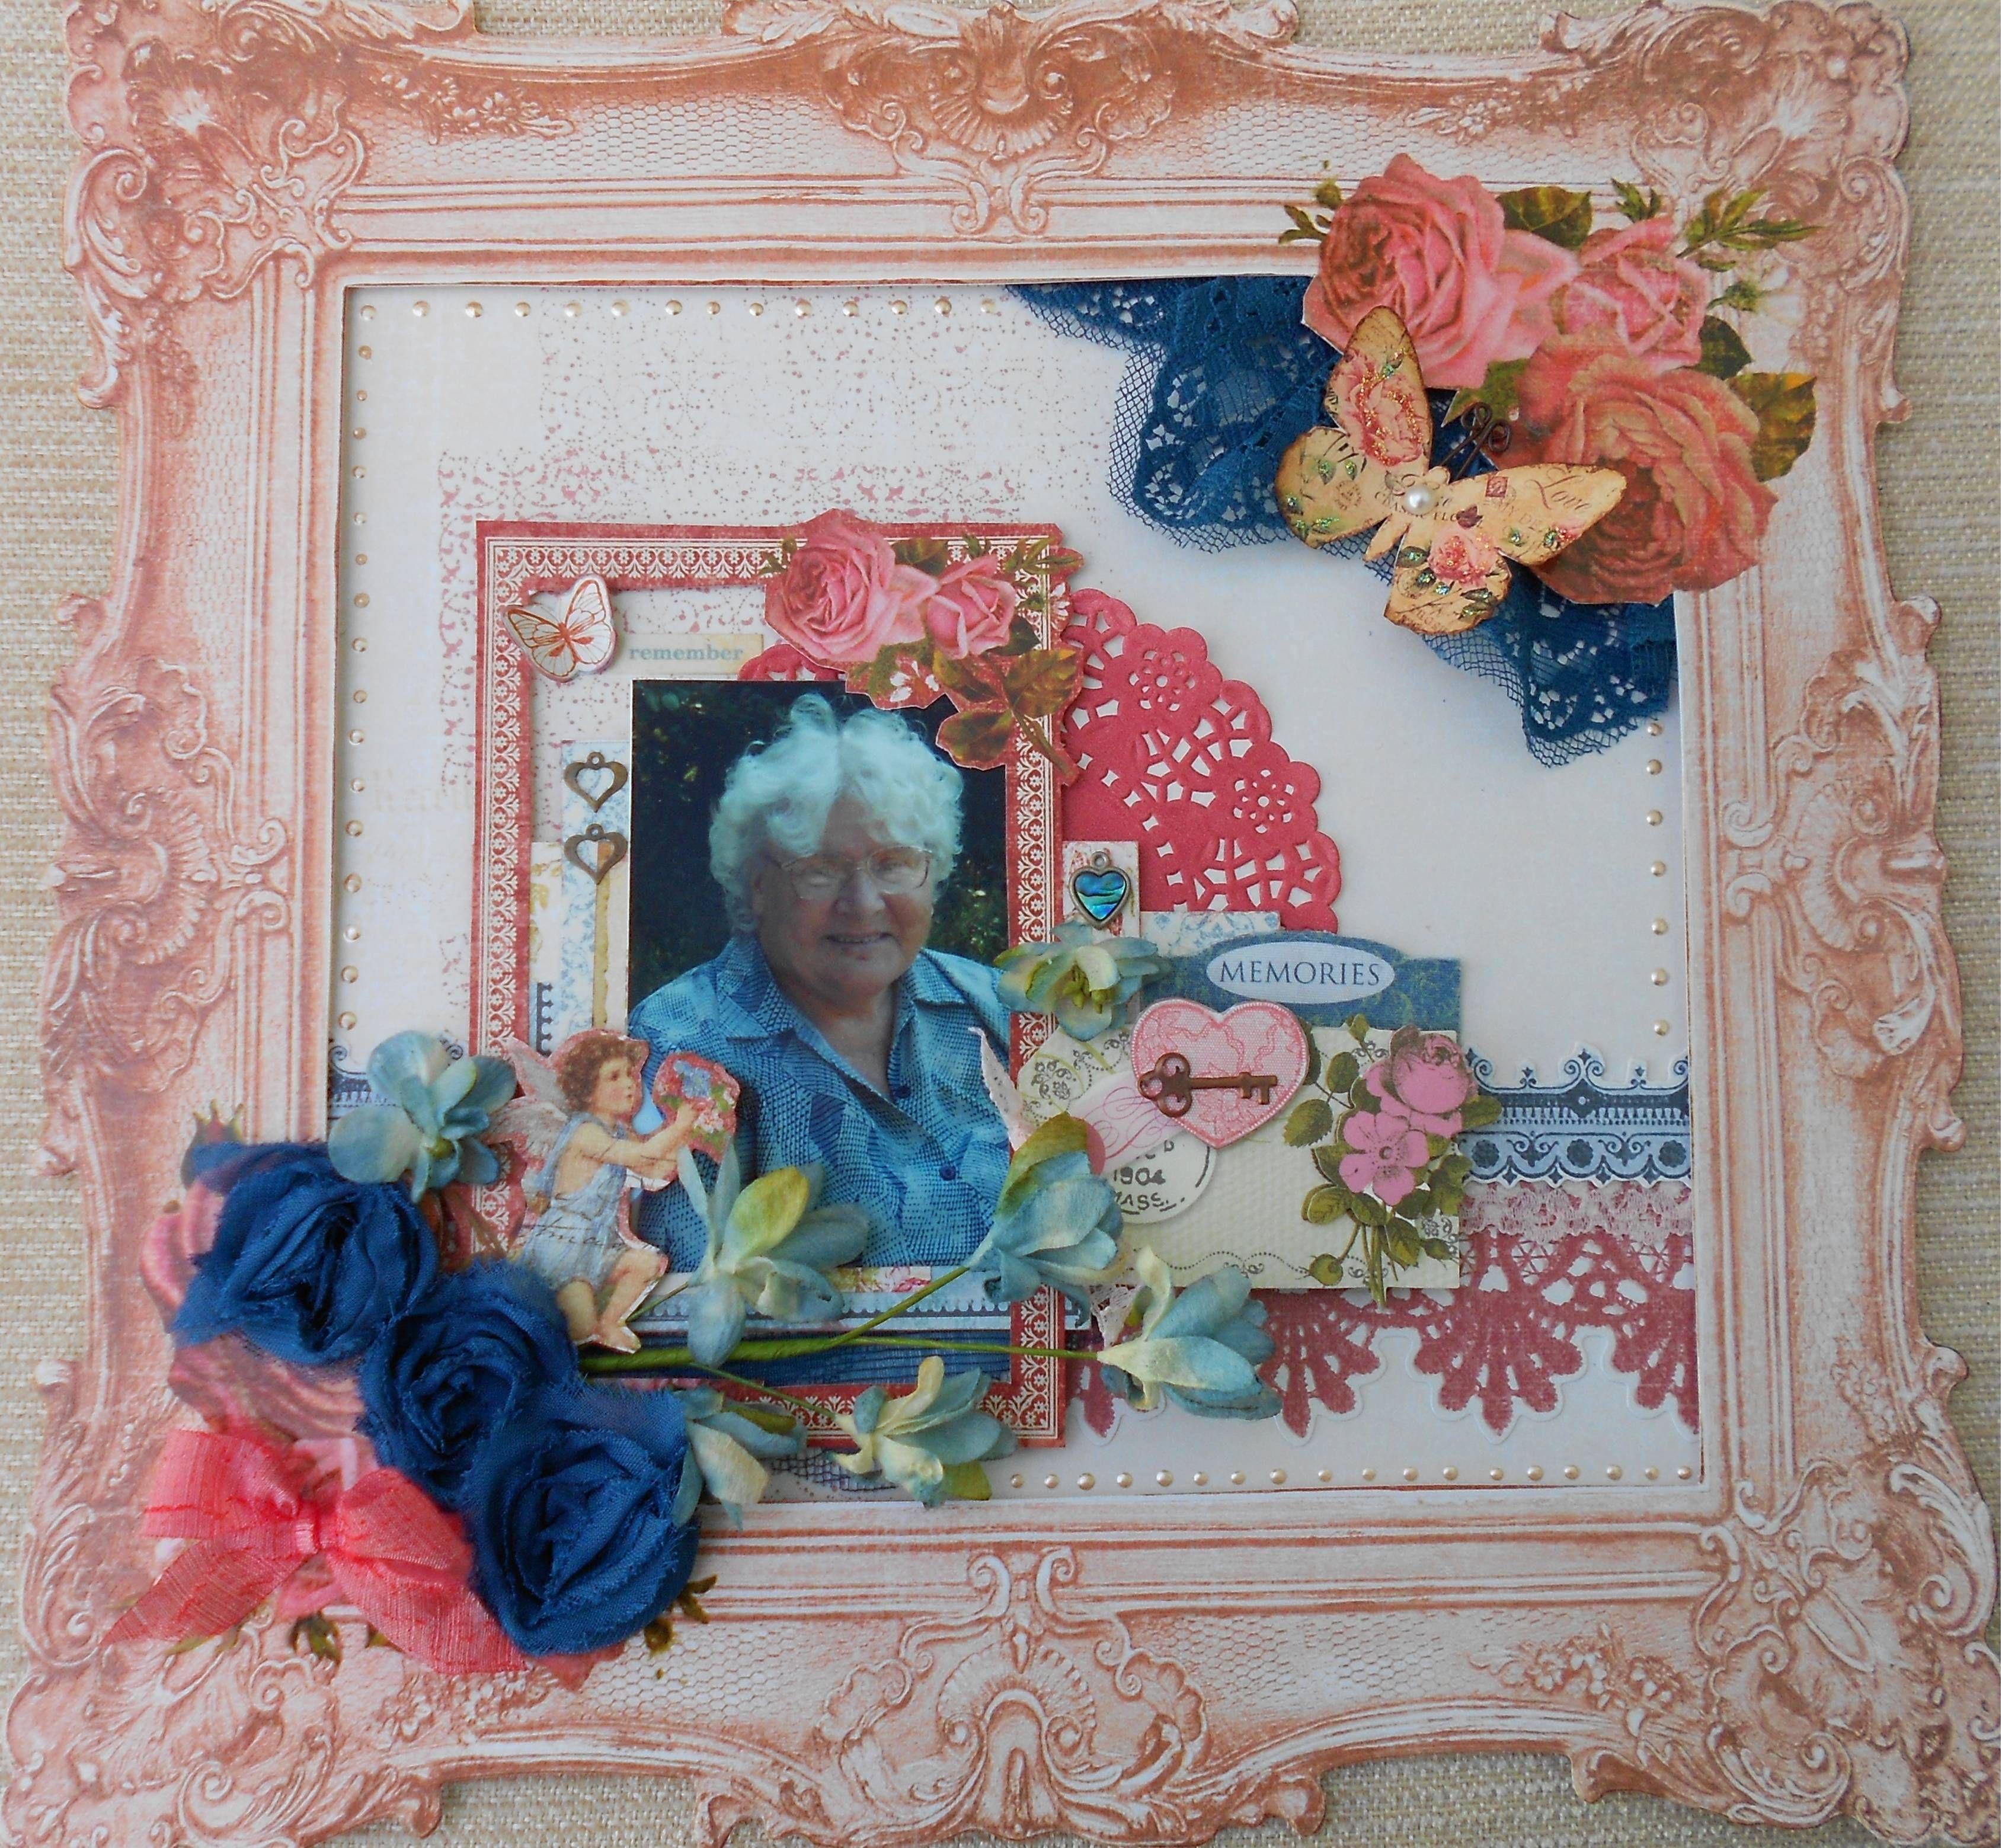 Nan *Scraps of Elegance* -  Kaisercraft 'Key To My Heart' papers